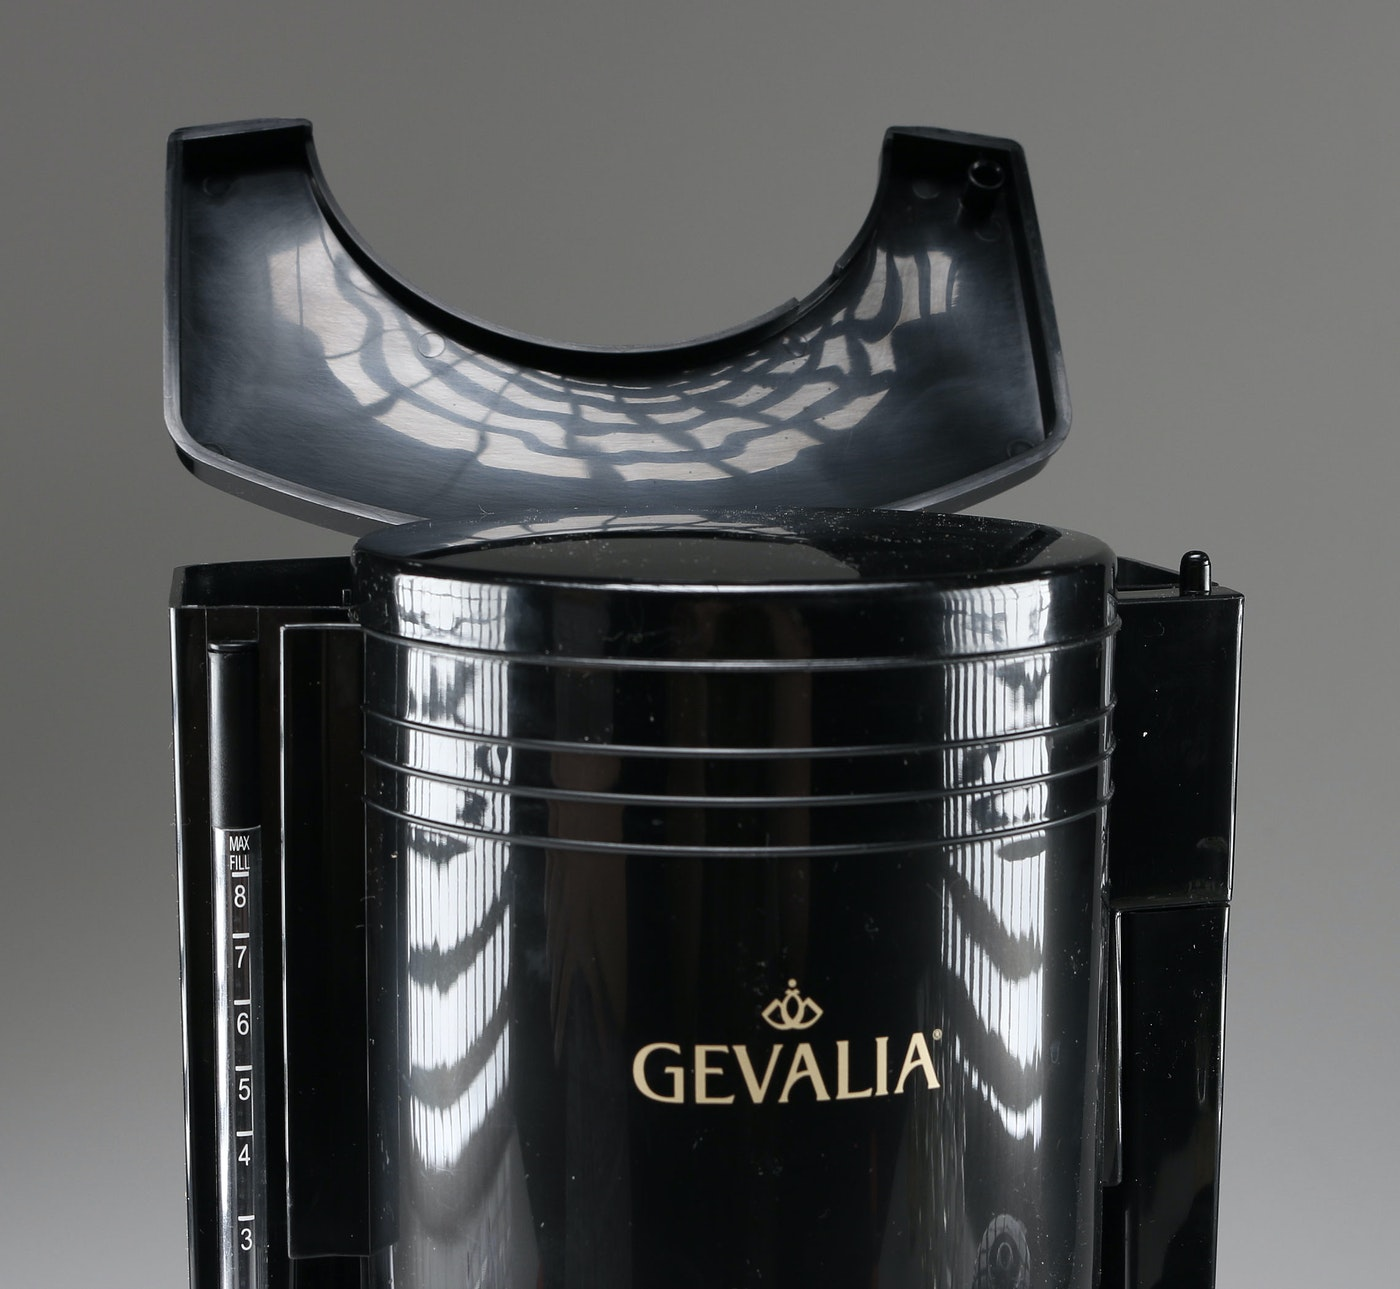 Gevalia Coffee Maker Filter Basket : 8-Cup Automatic Thermal Carafe Coffee Maker by Gevalia : EBTH